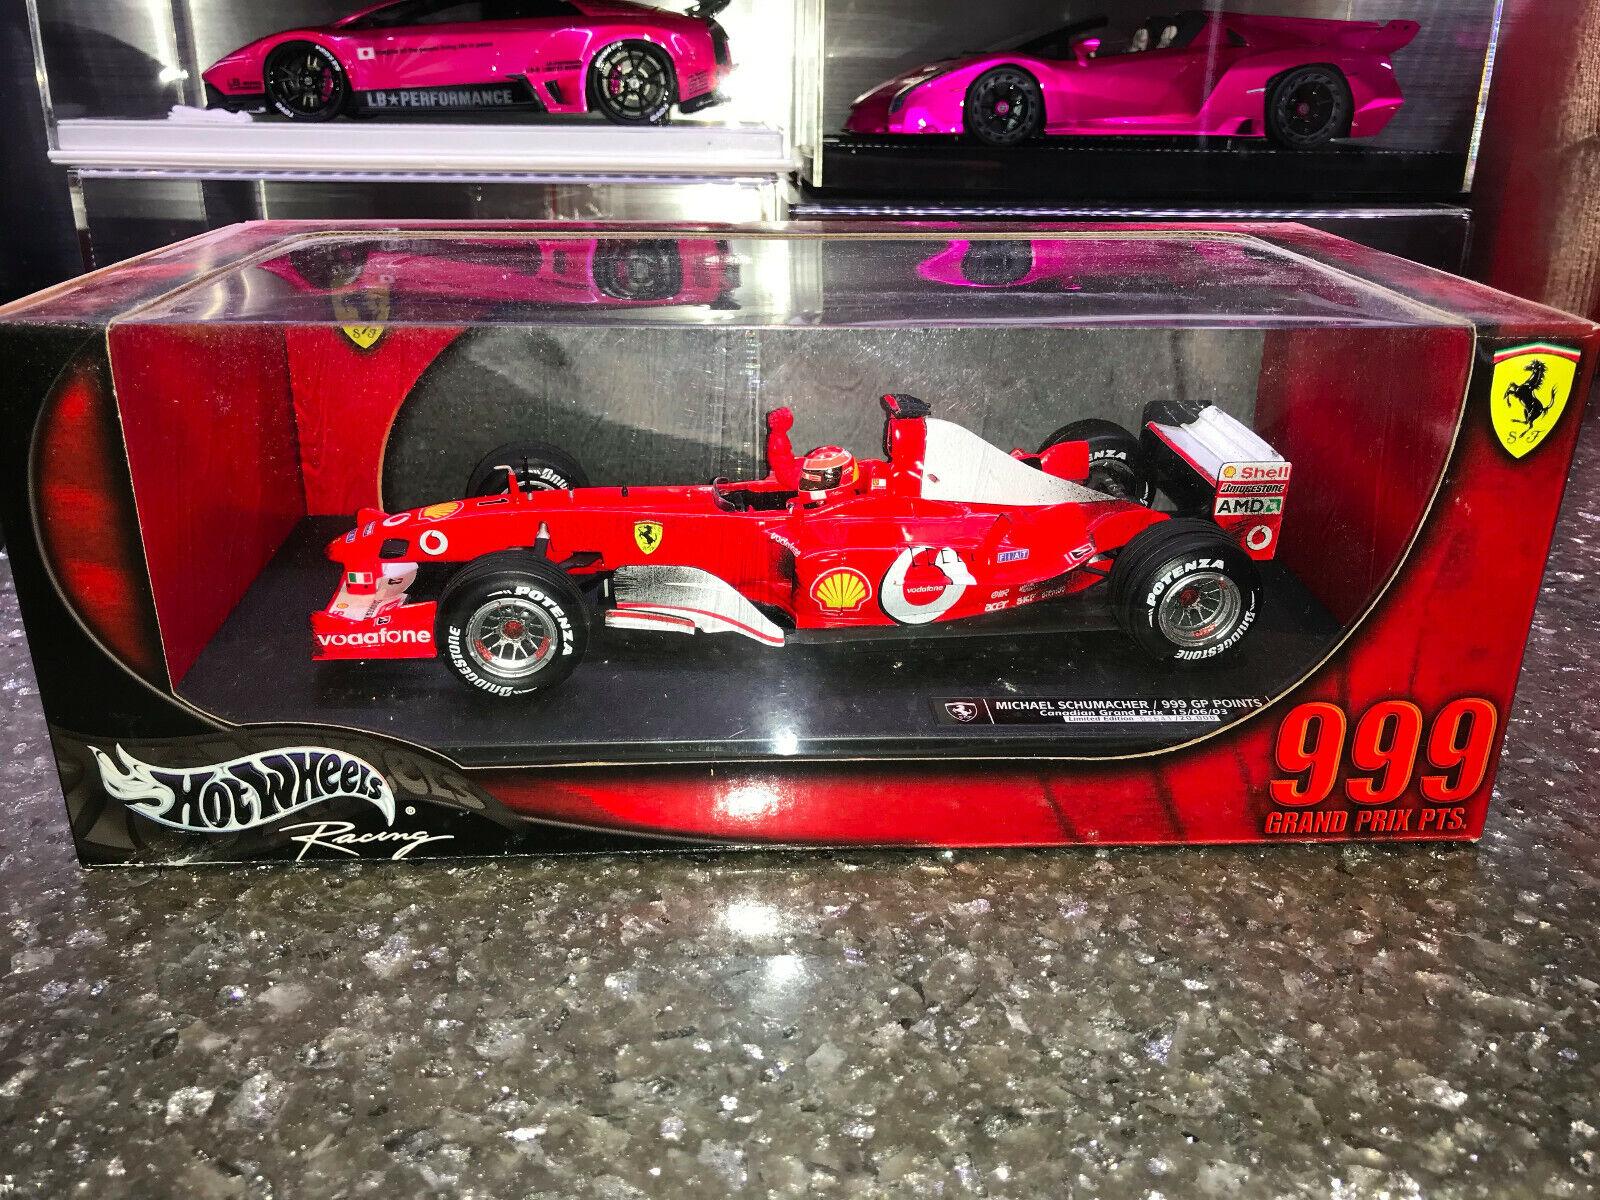 Envio gratis en todas las ordenes 1 18 Mattel 2003 Ferrari Ferrari Ferrari F2003GA Edición M. Schumacher 999 GP PTS  mas preferencial